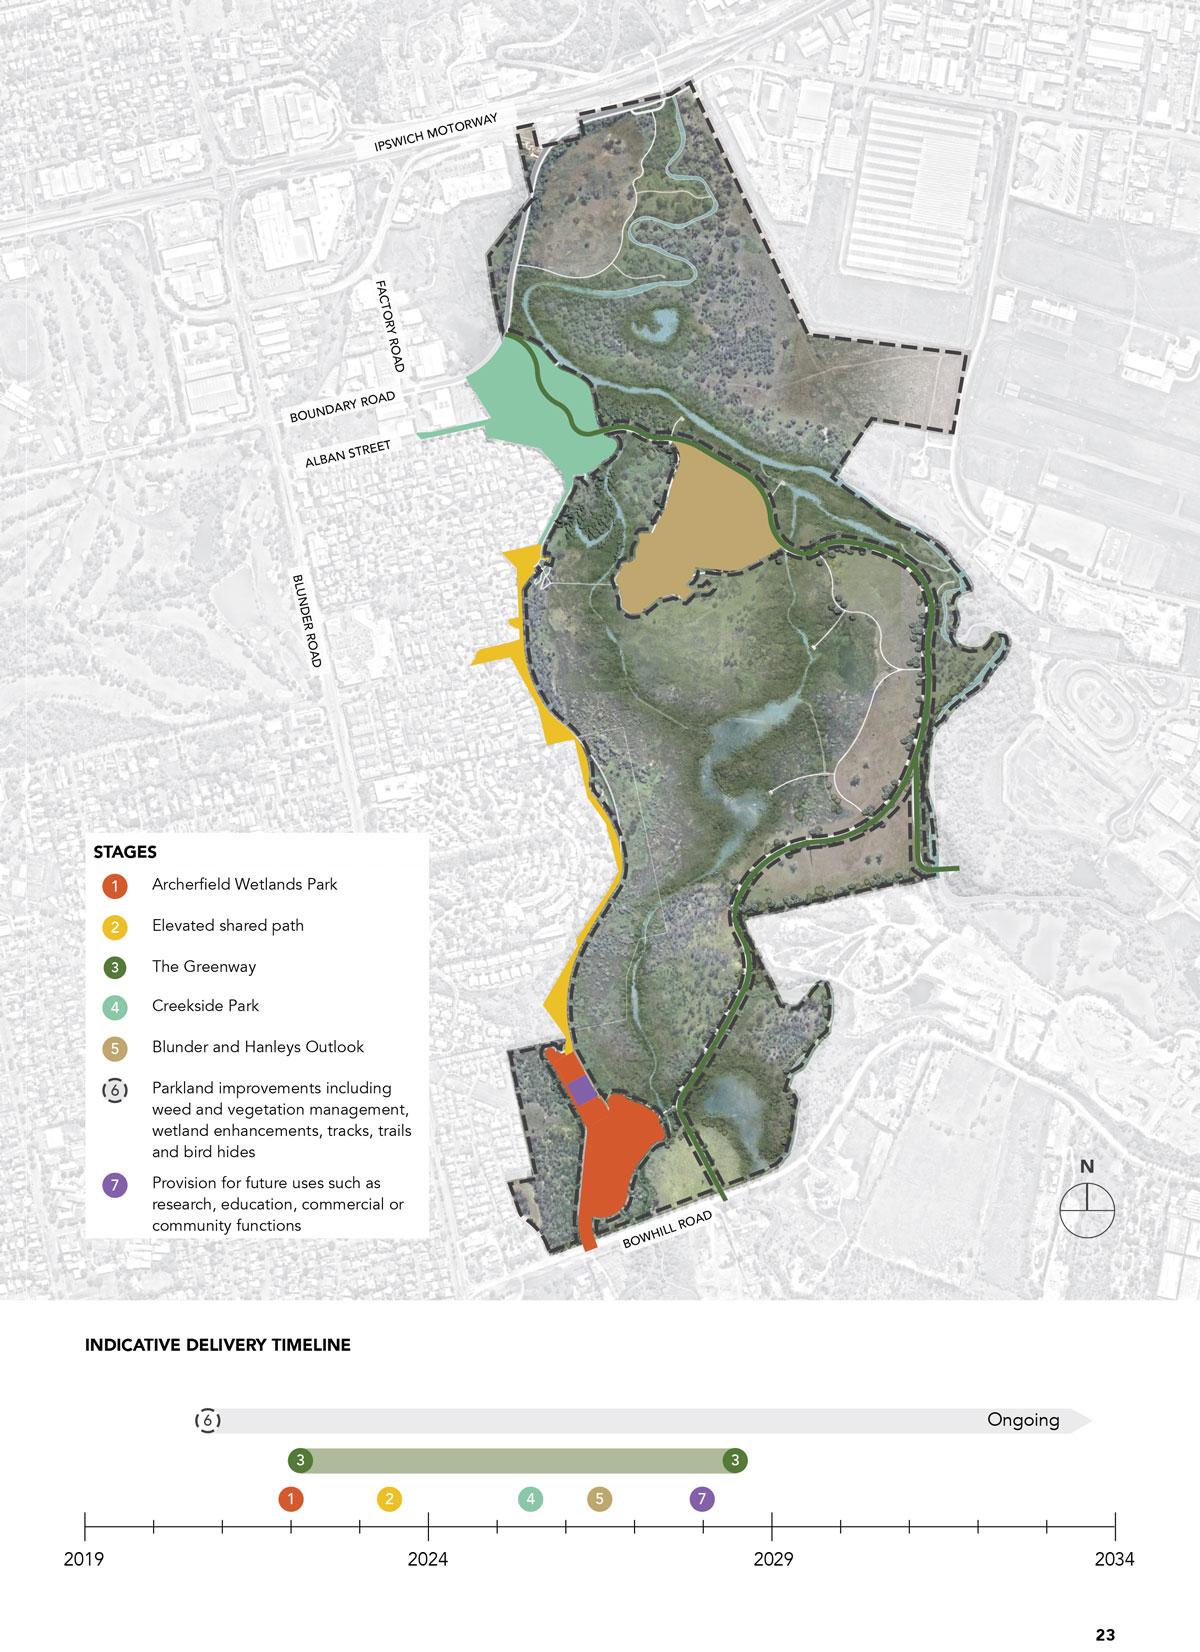 Staging plan of Archerfield Wetlands